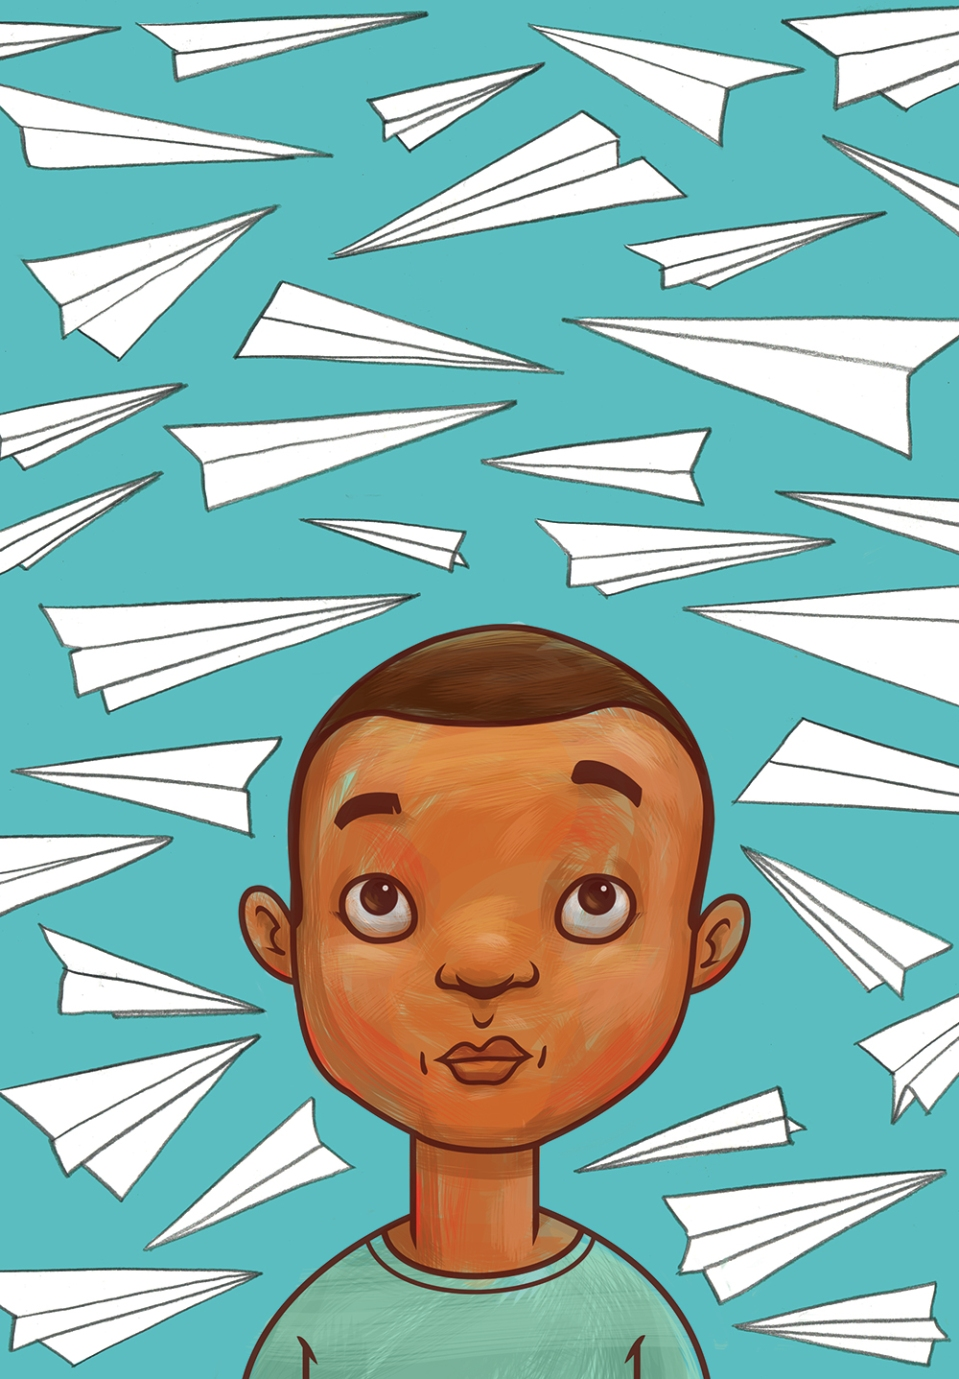 paper-planes-no15.jpg